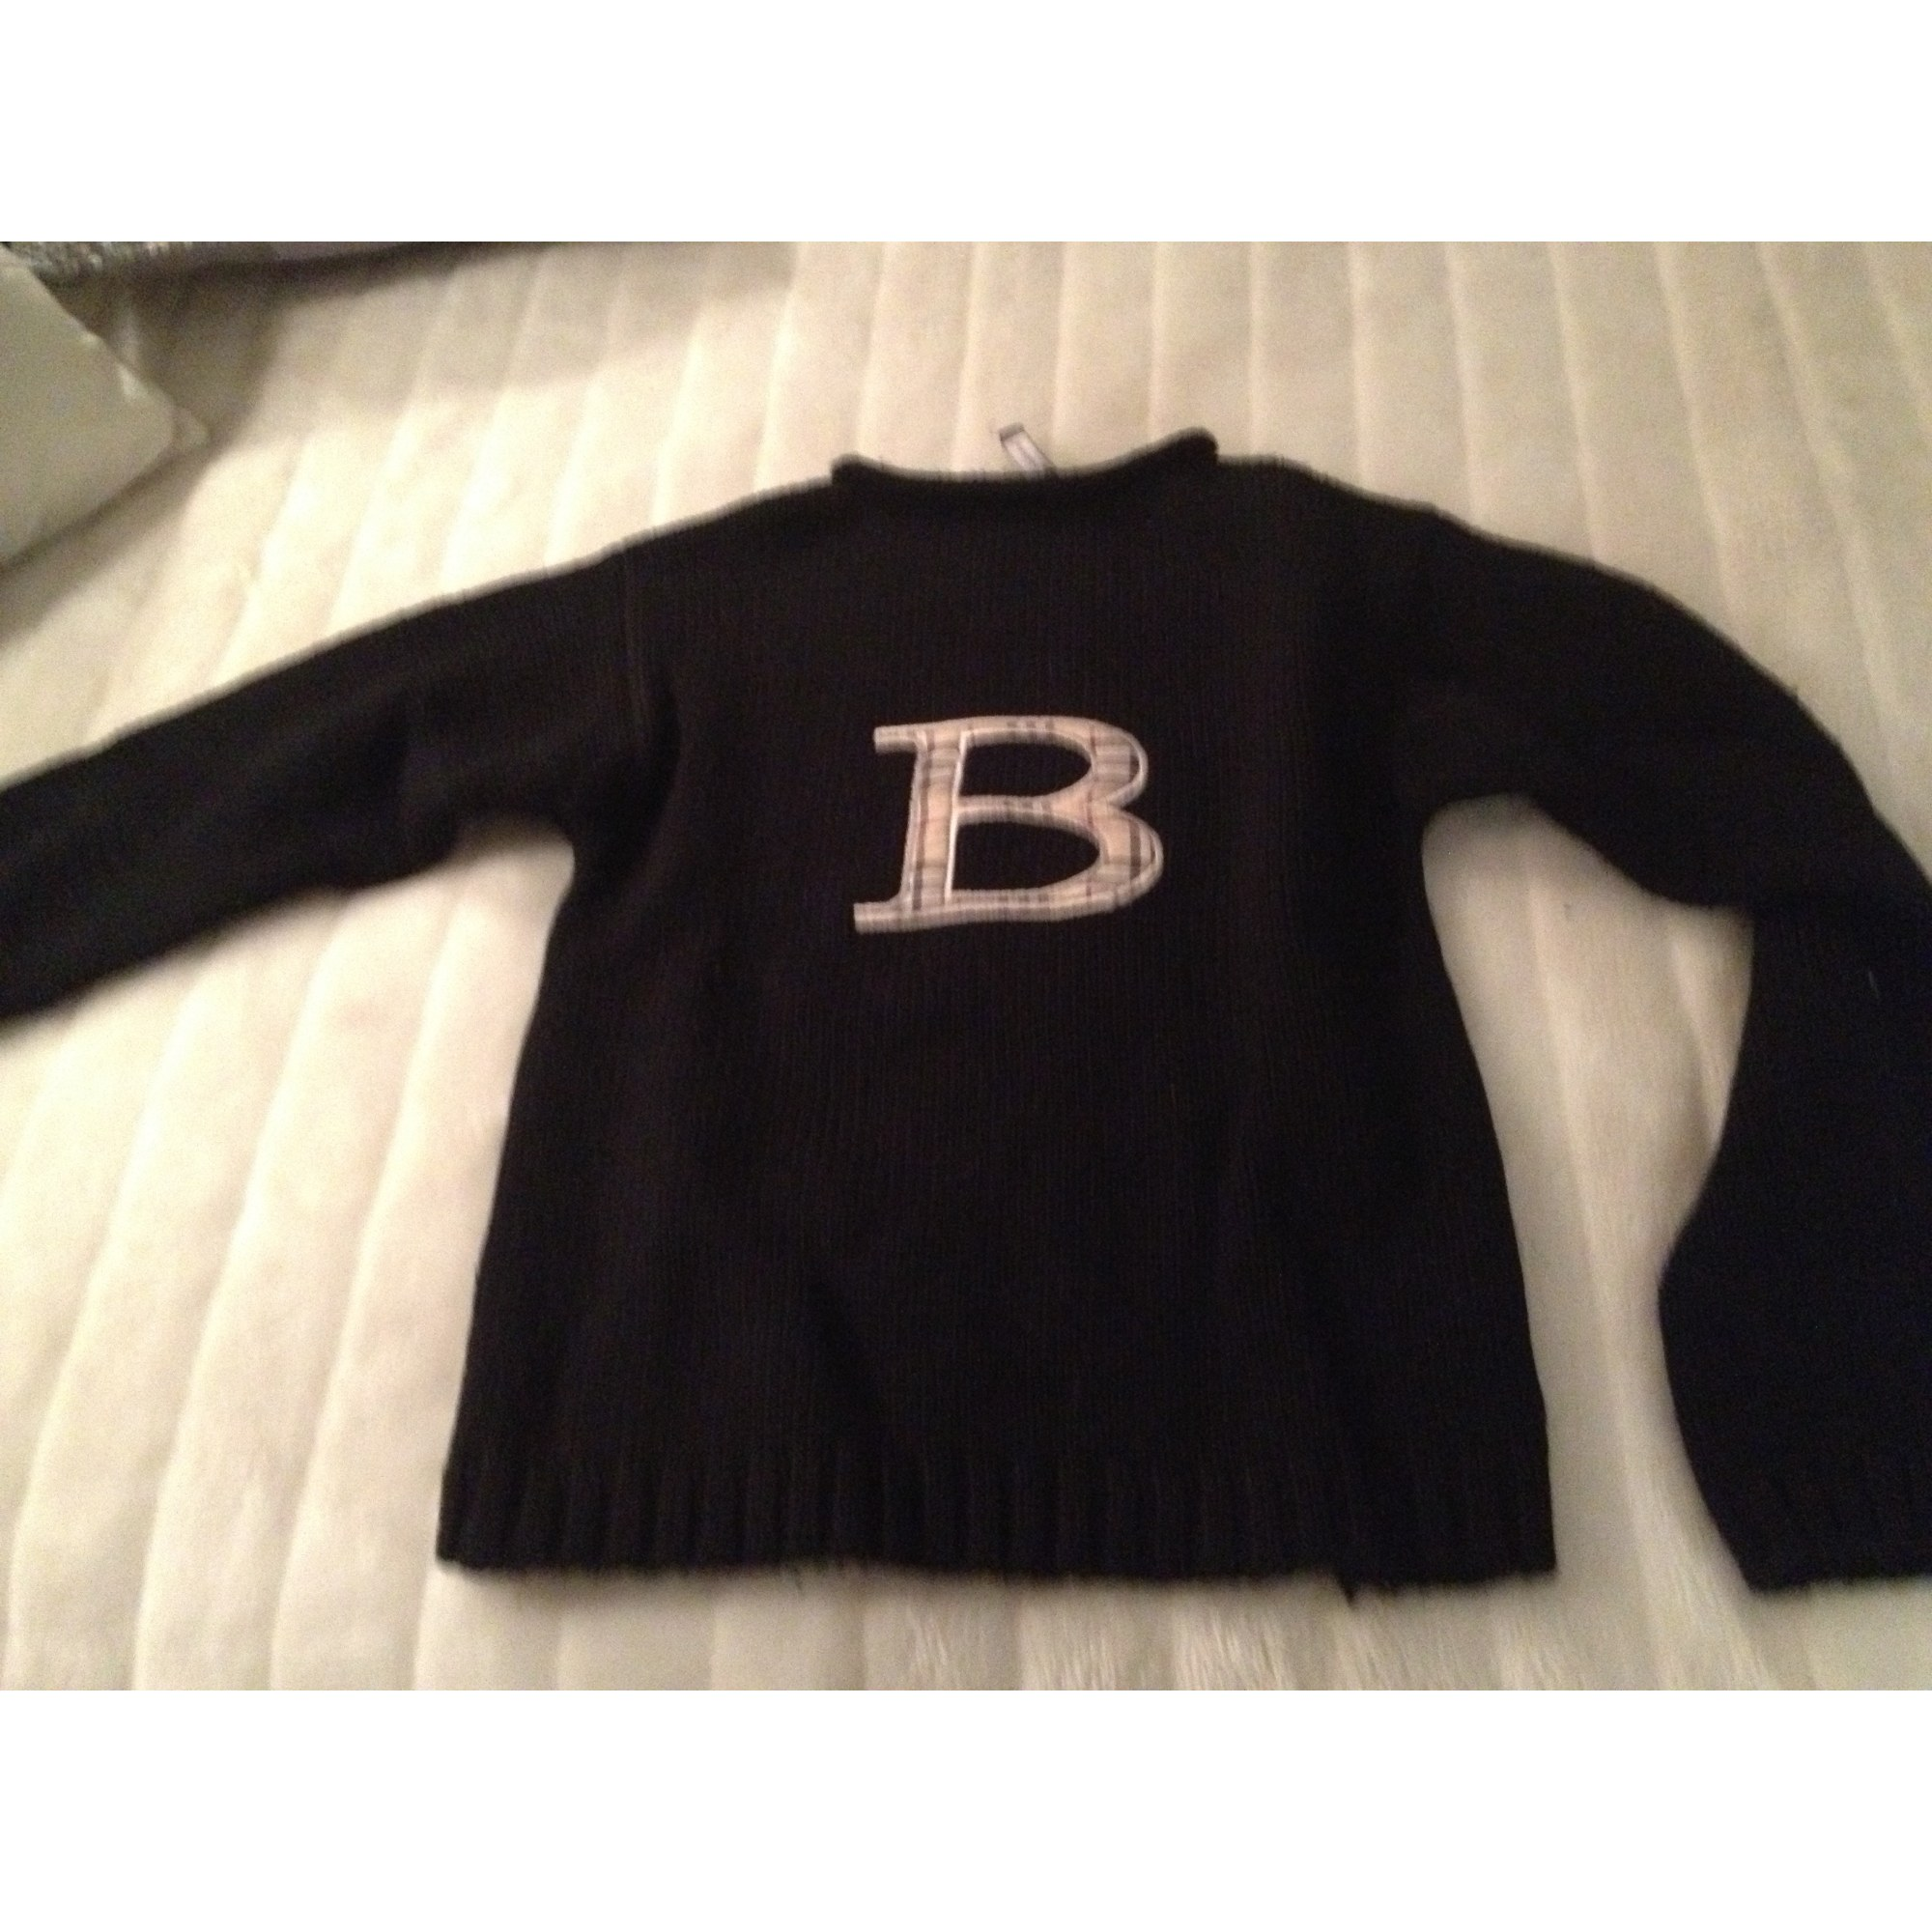 4ddcfad9baa7 Pull BURBERRY 11-12 ans noir vendu par D ainara150702 - 1912685